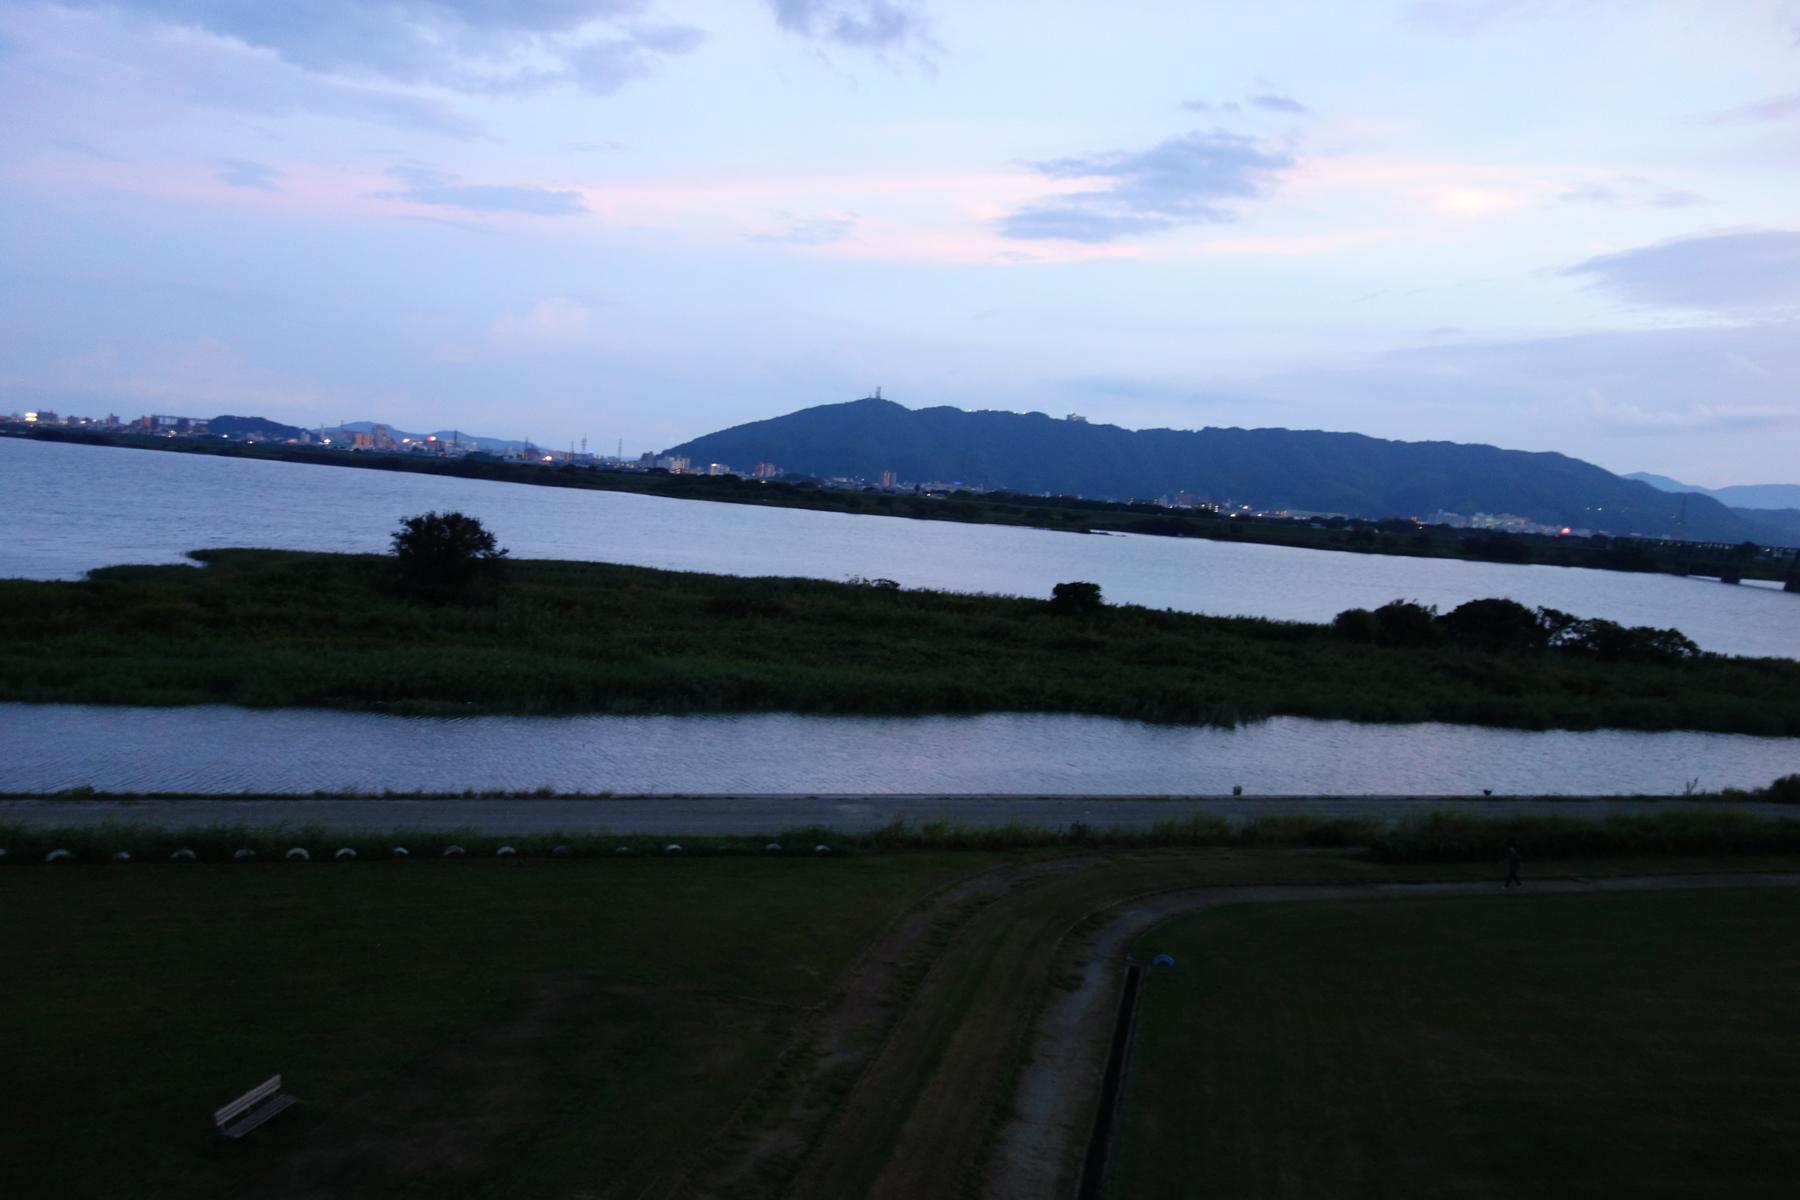 http://dplan-coltd.jp/sky/sample/DSC00266.JPG